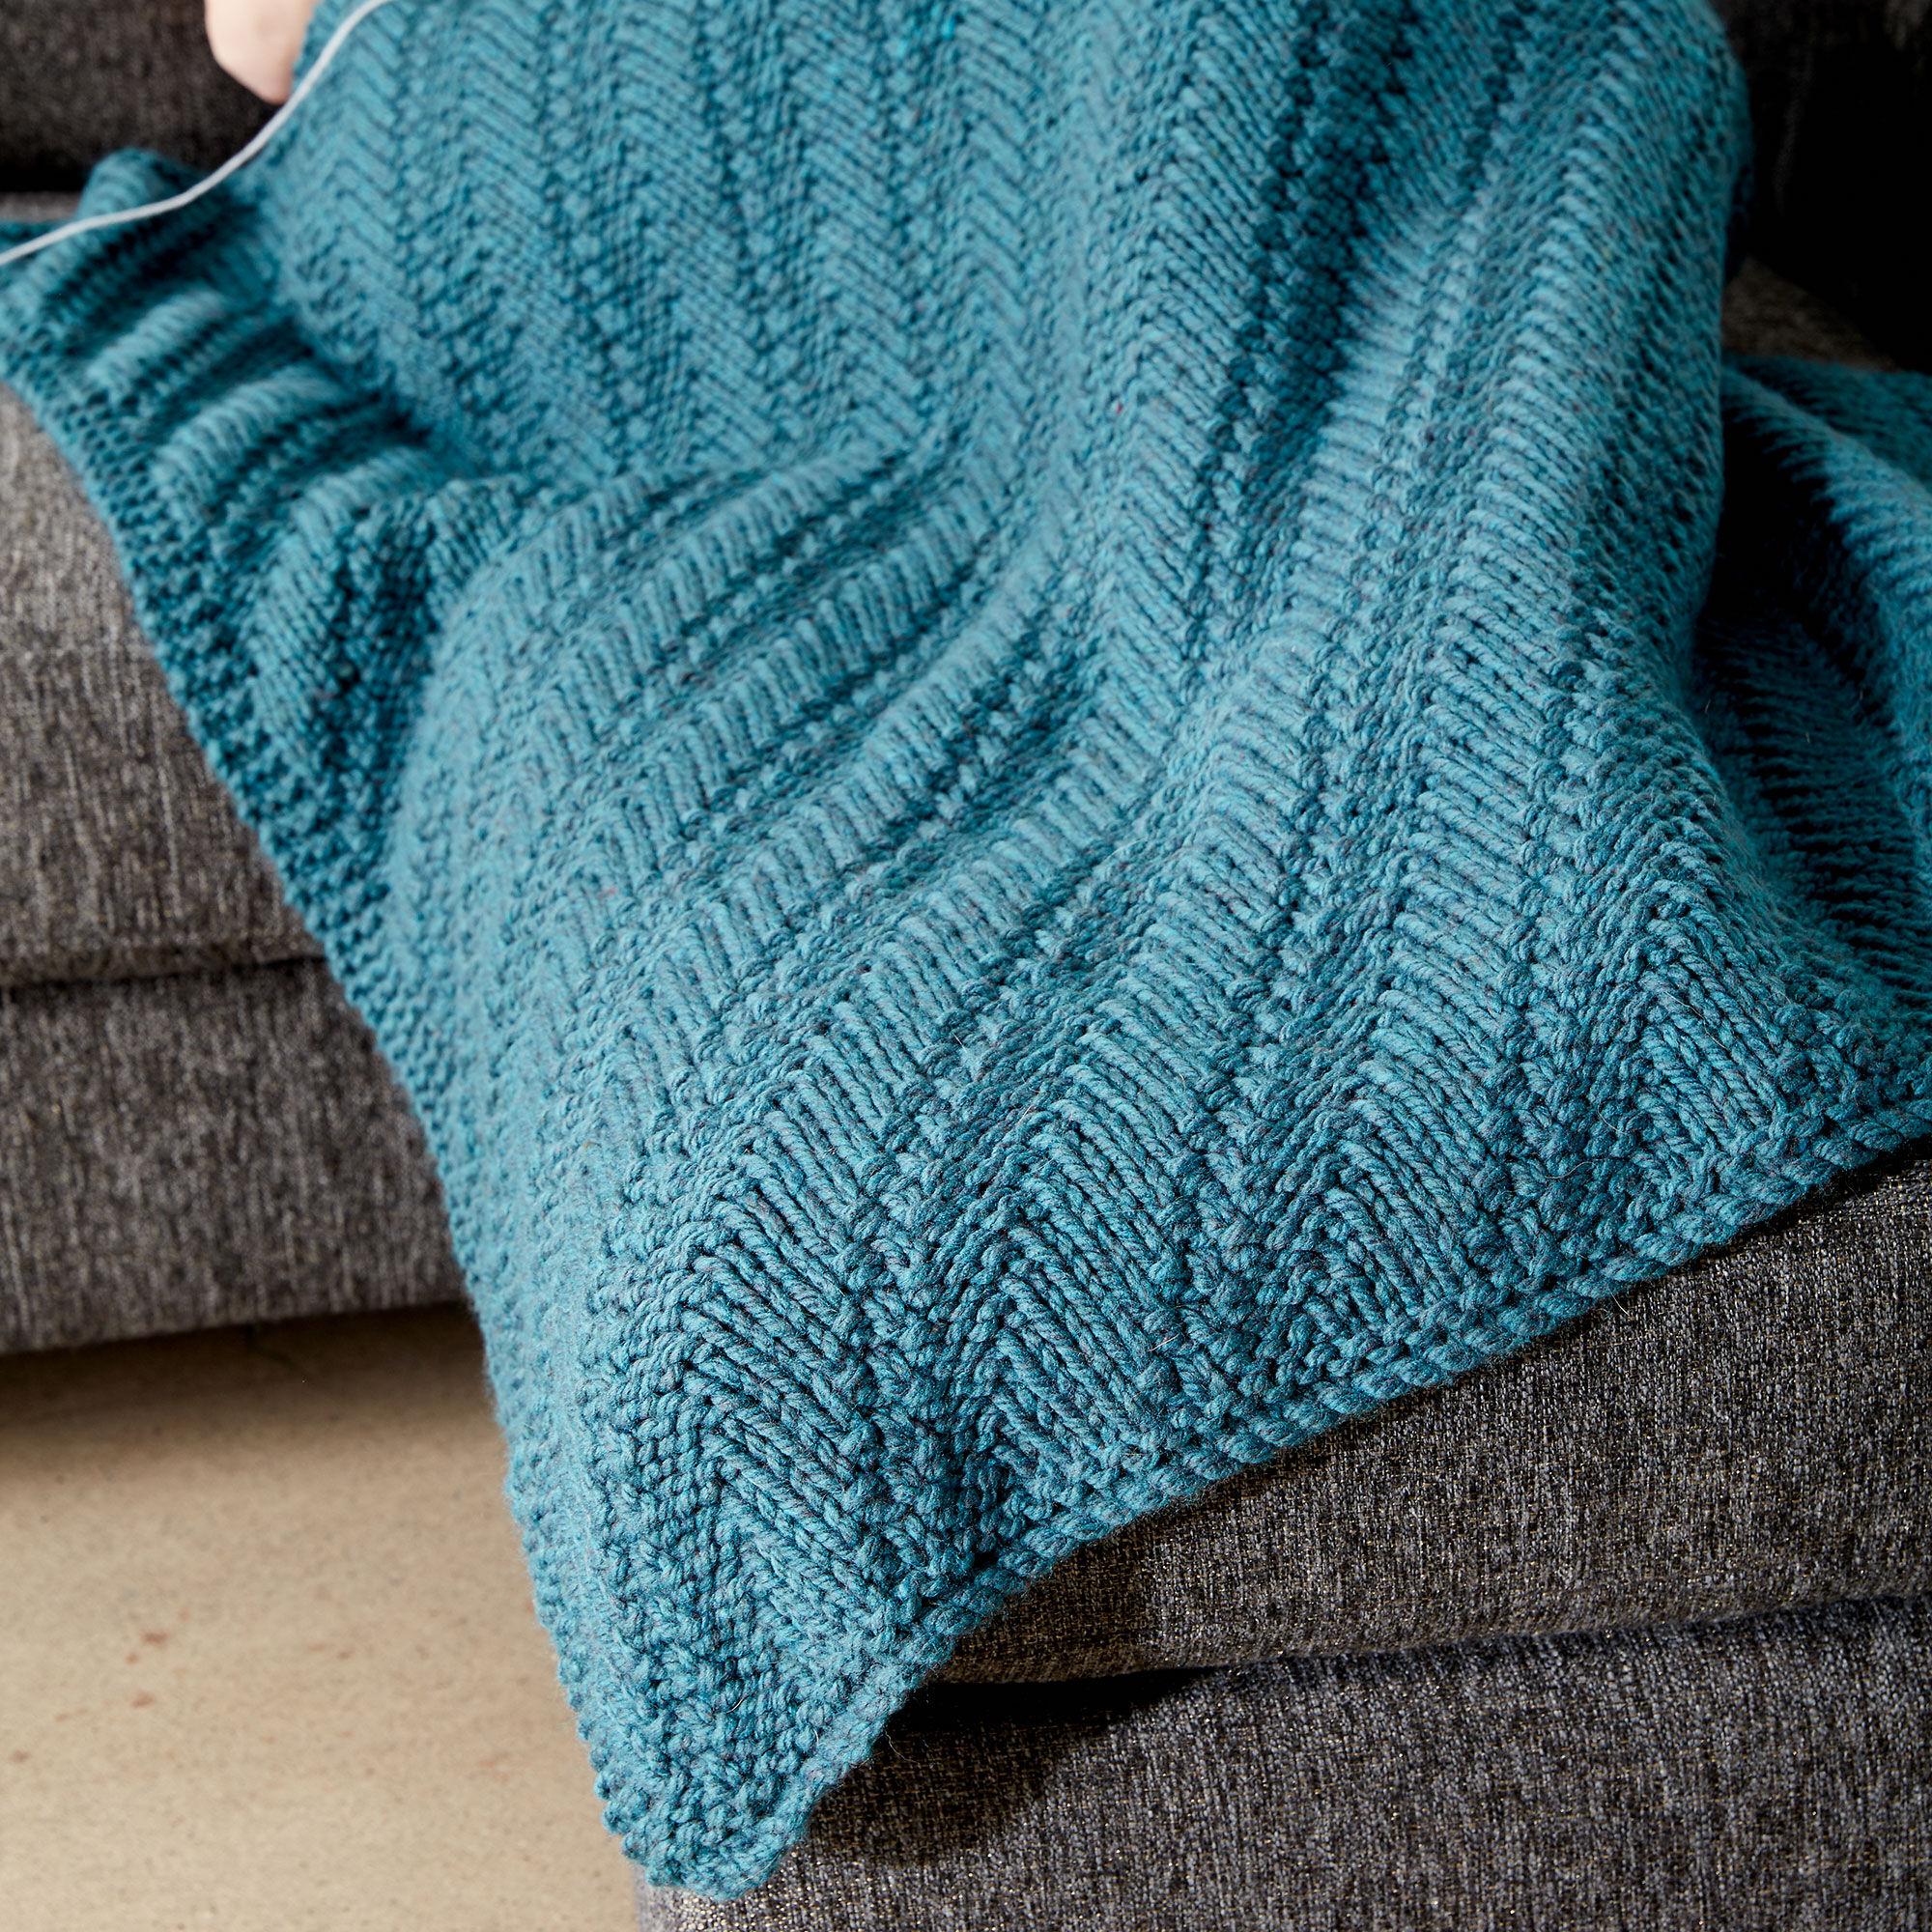 Reversible knitting patterns for blankets